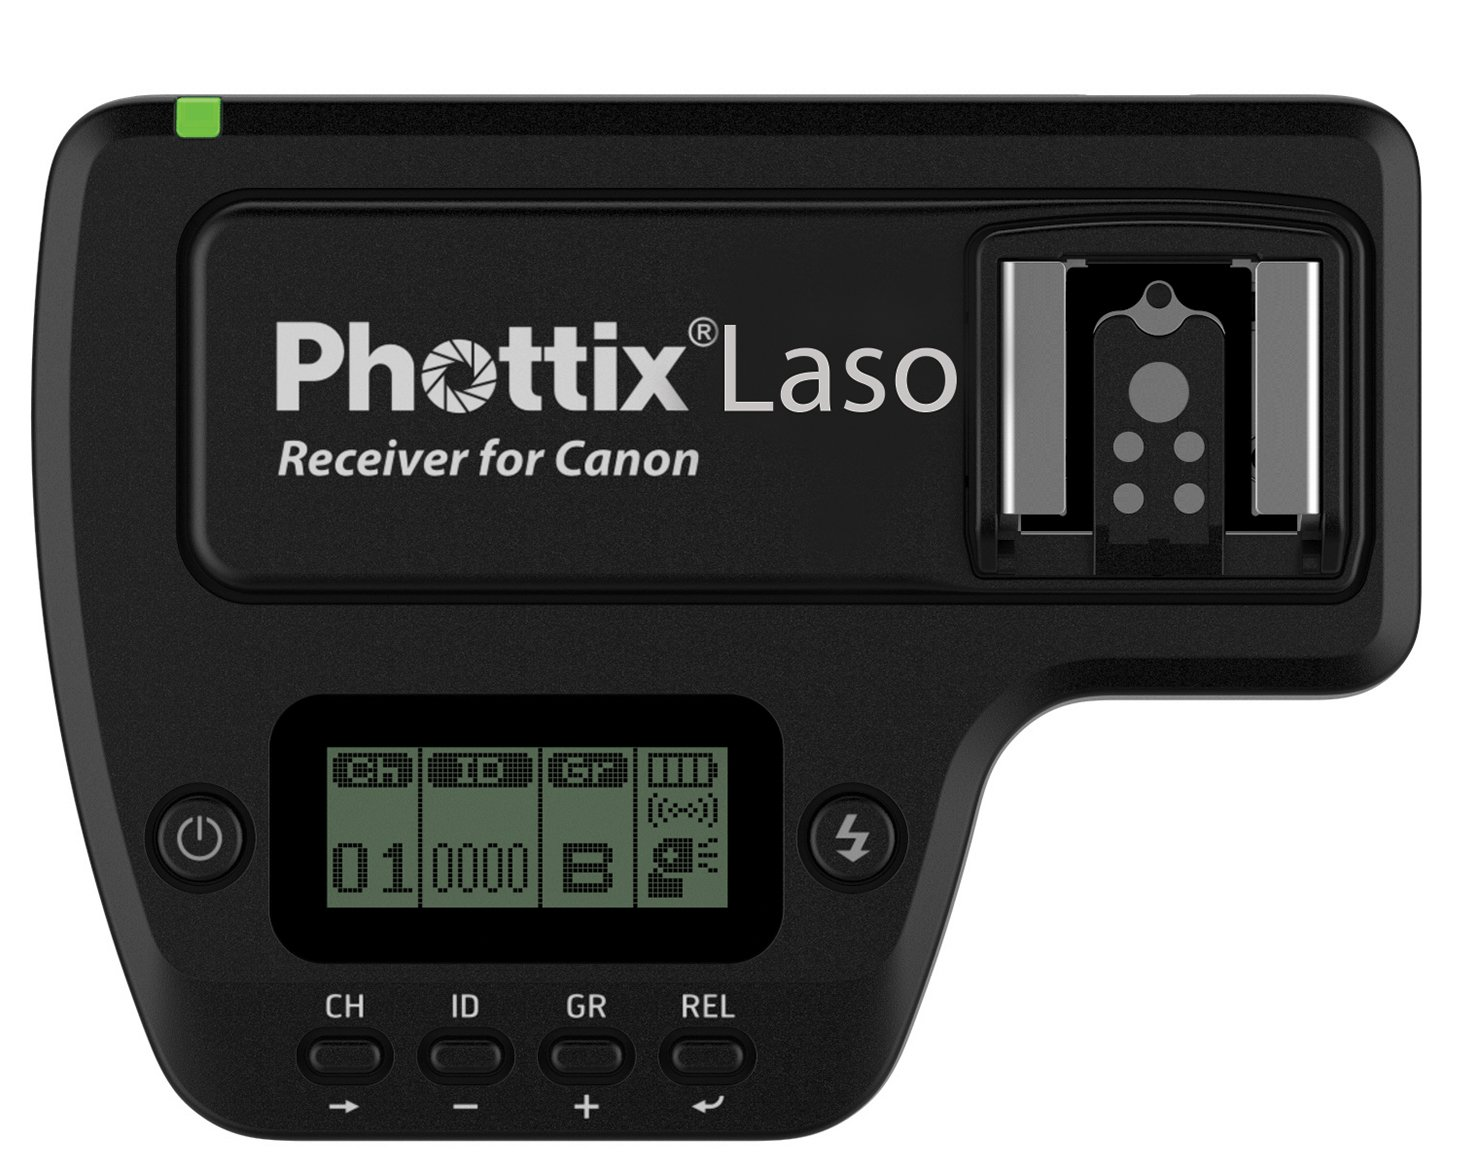 Phottix Laso TTL Flash Trigger Receiver for Canon (PH89091)